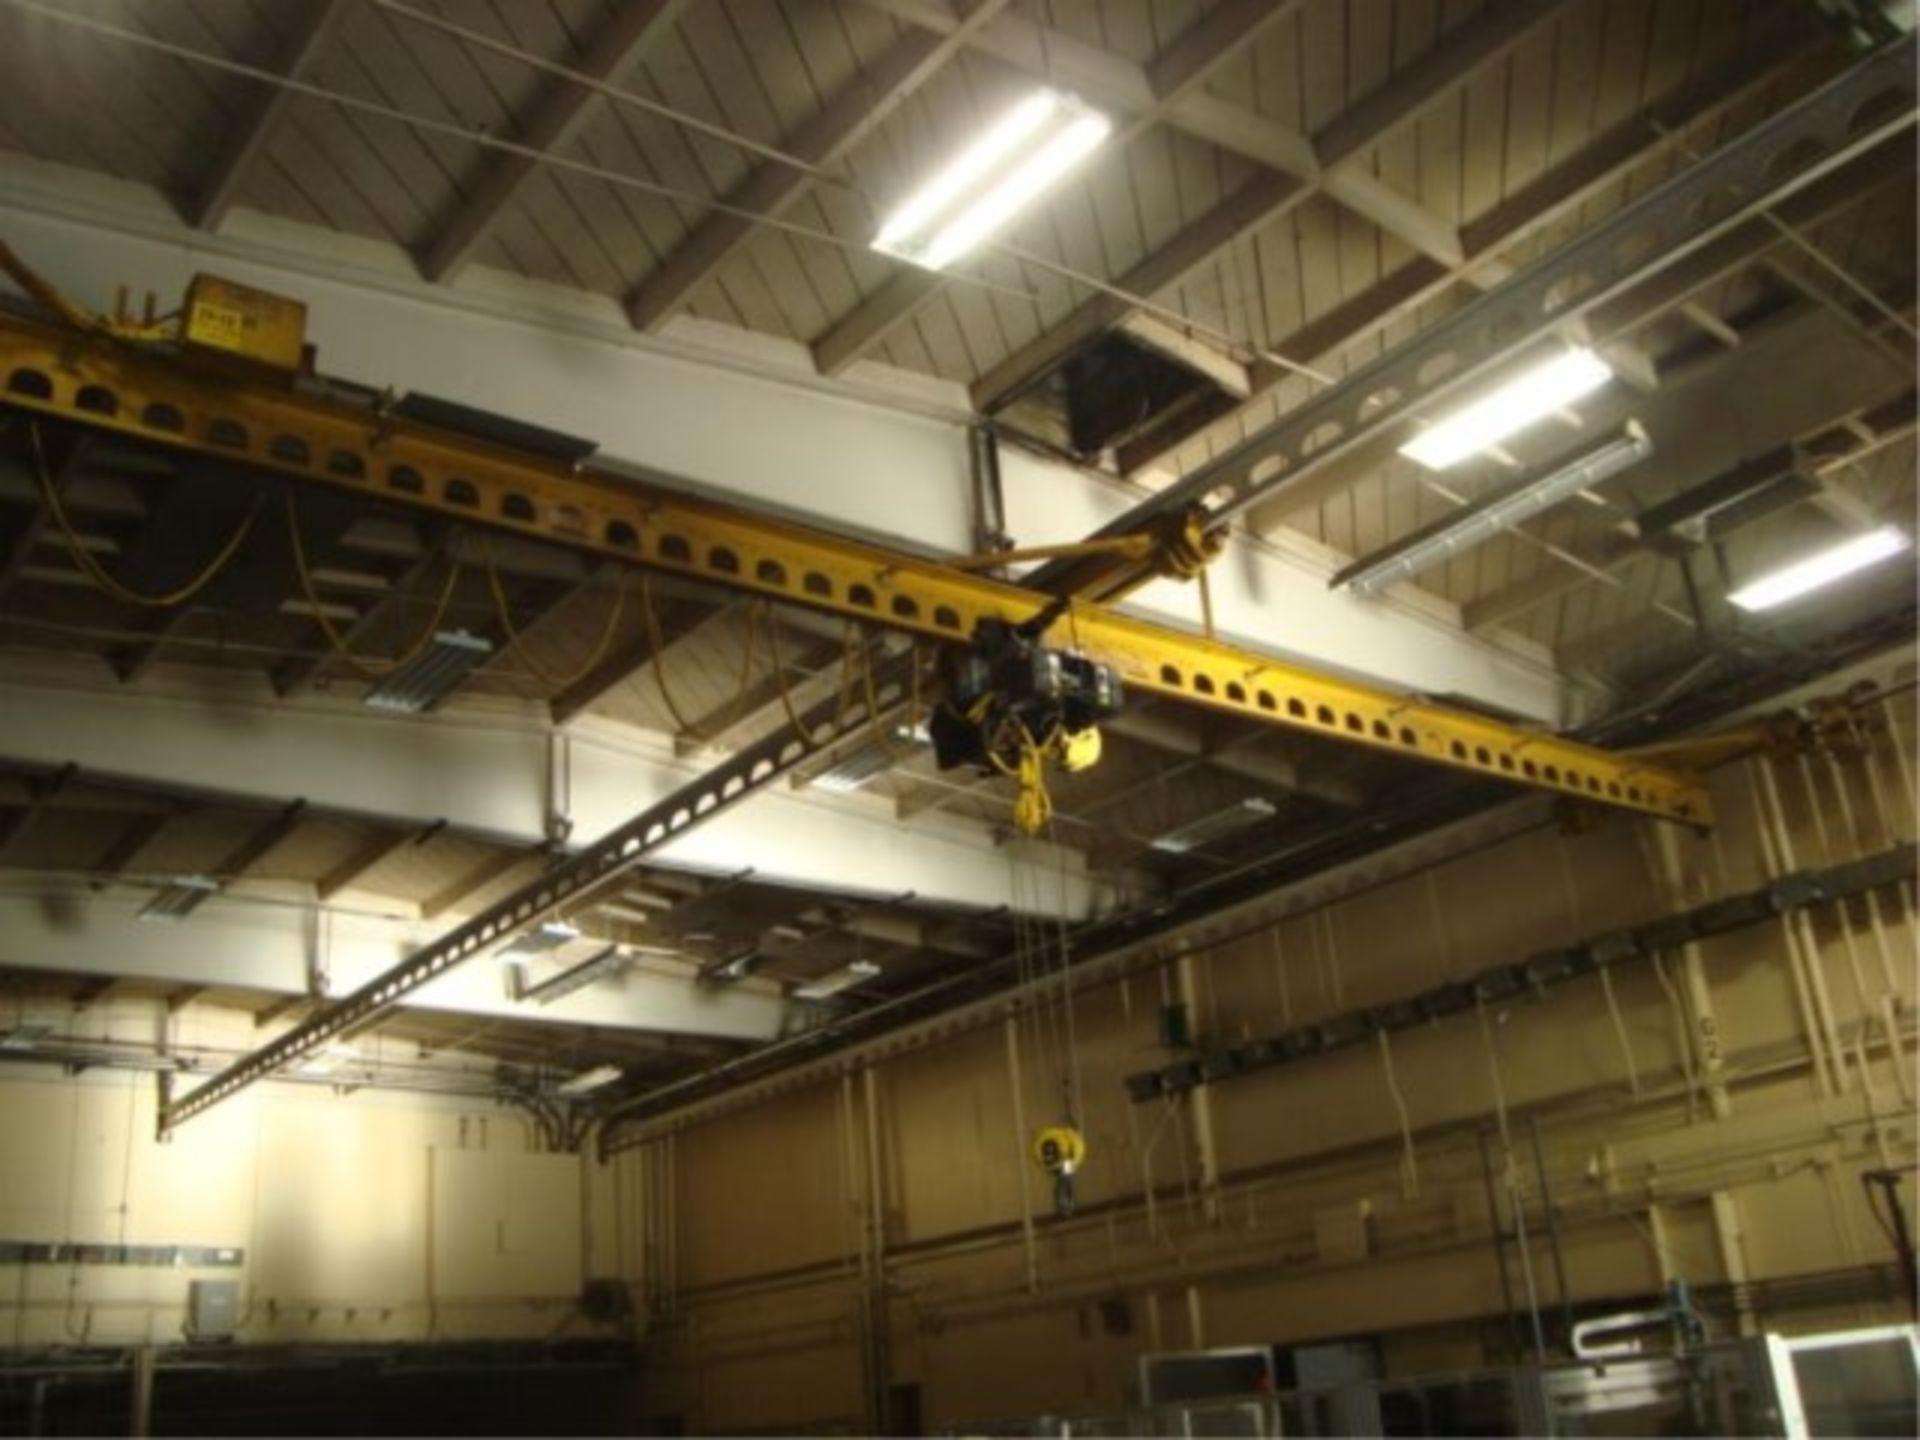 Lot 109 - 5-Ton Capacity Overhead Bridge Crane